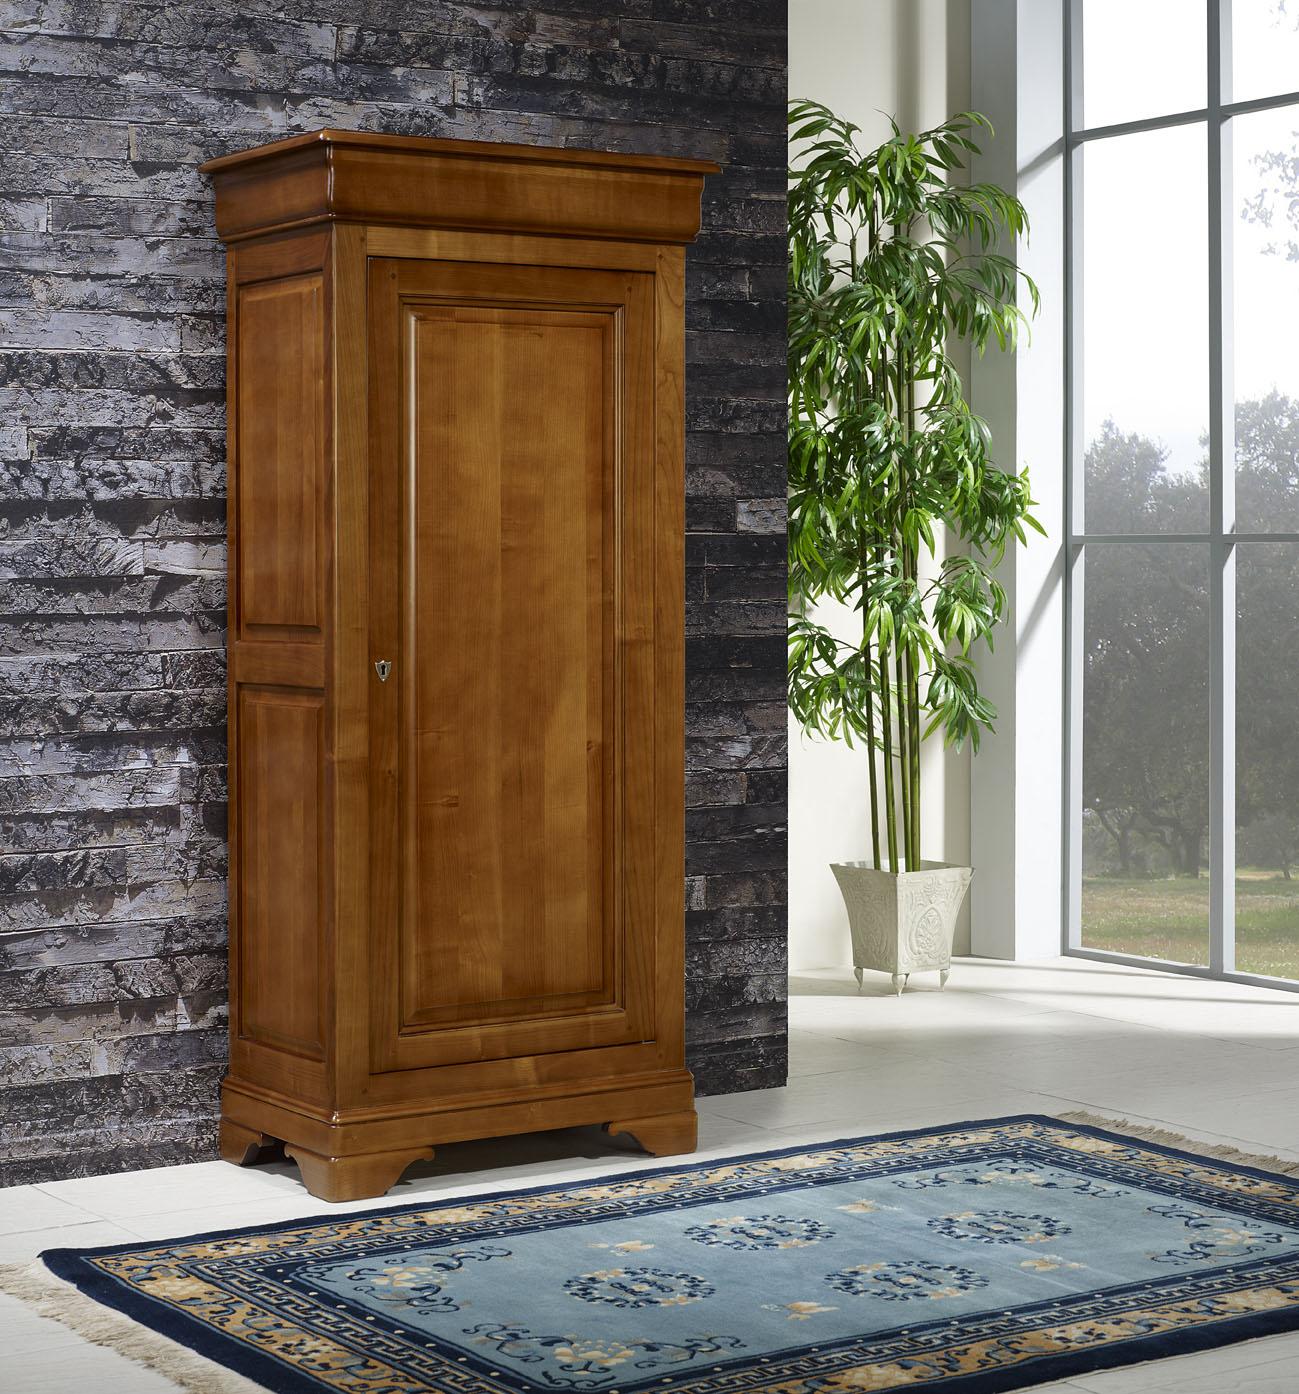 Bonneti re en merisier massif de style louis philippe meuble en merisier massif - Meuble merisier style louis philippe ...